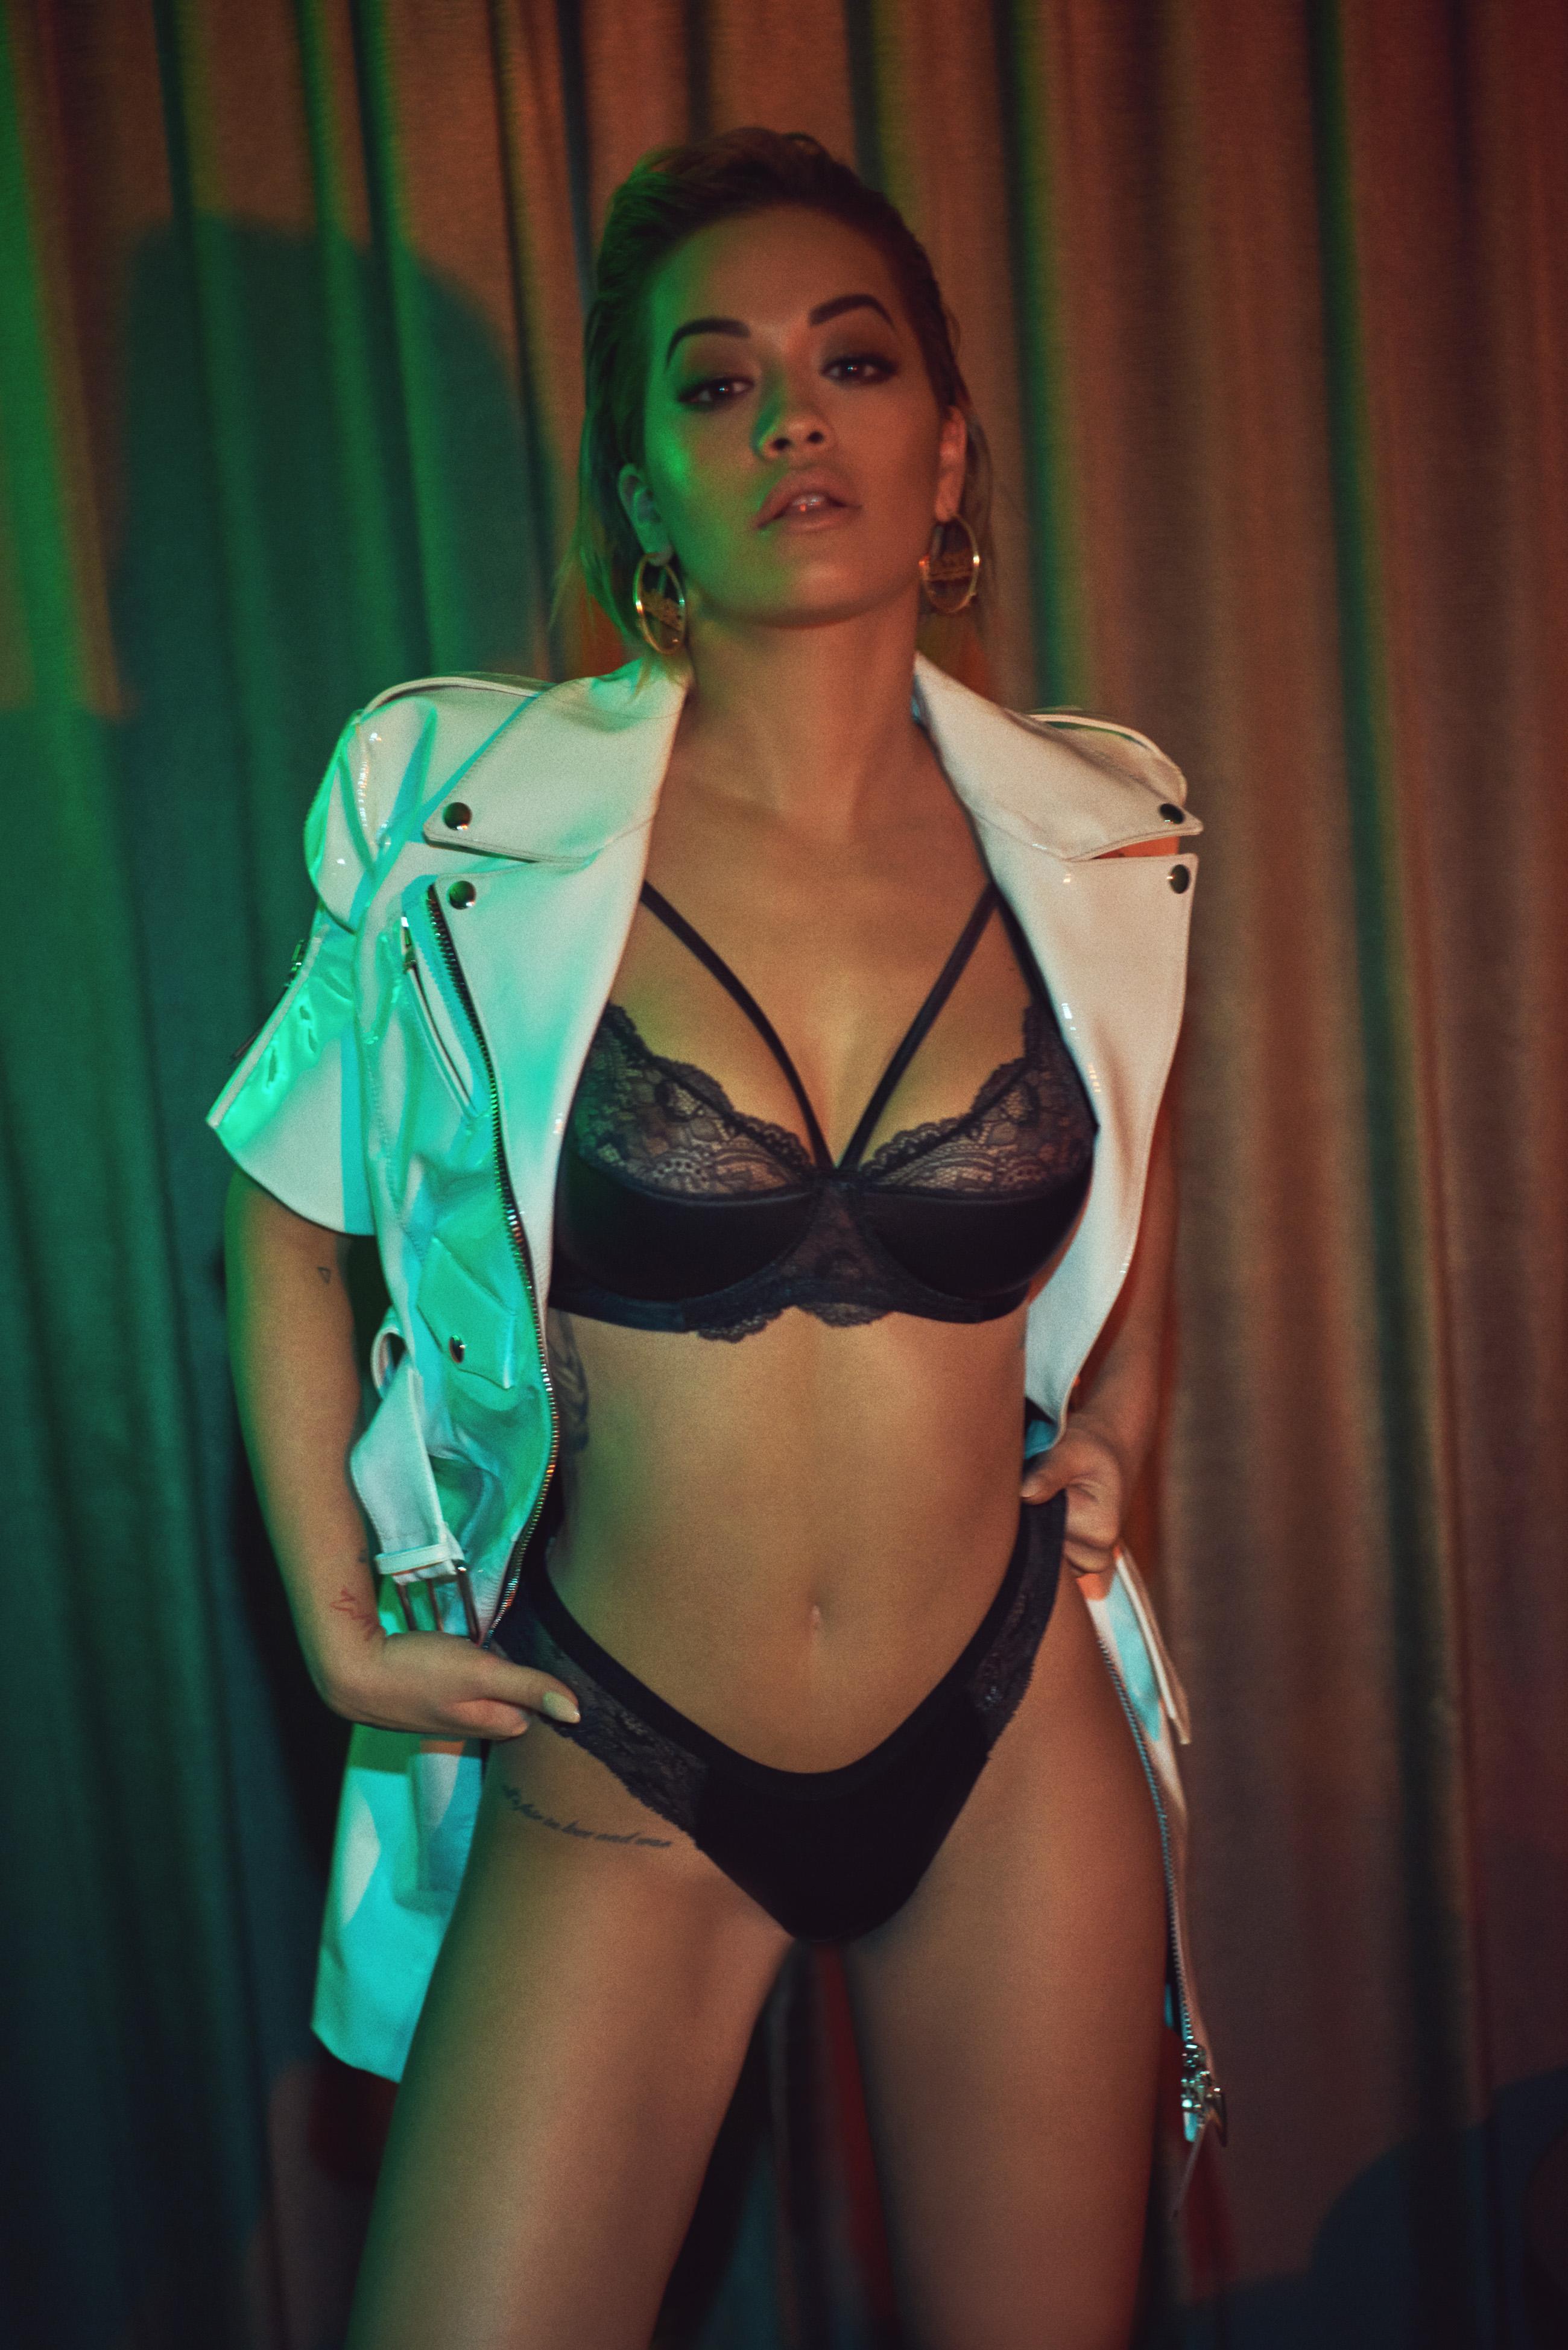 Porn Rita Ora nude (74 photo), Topless, Leaked, Feet, braless 2017